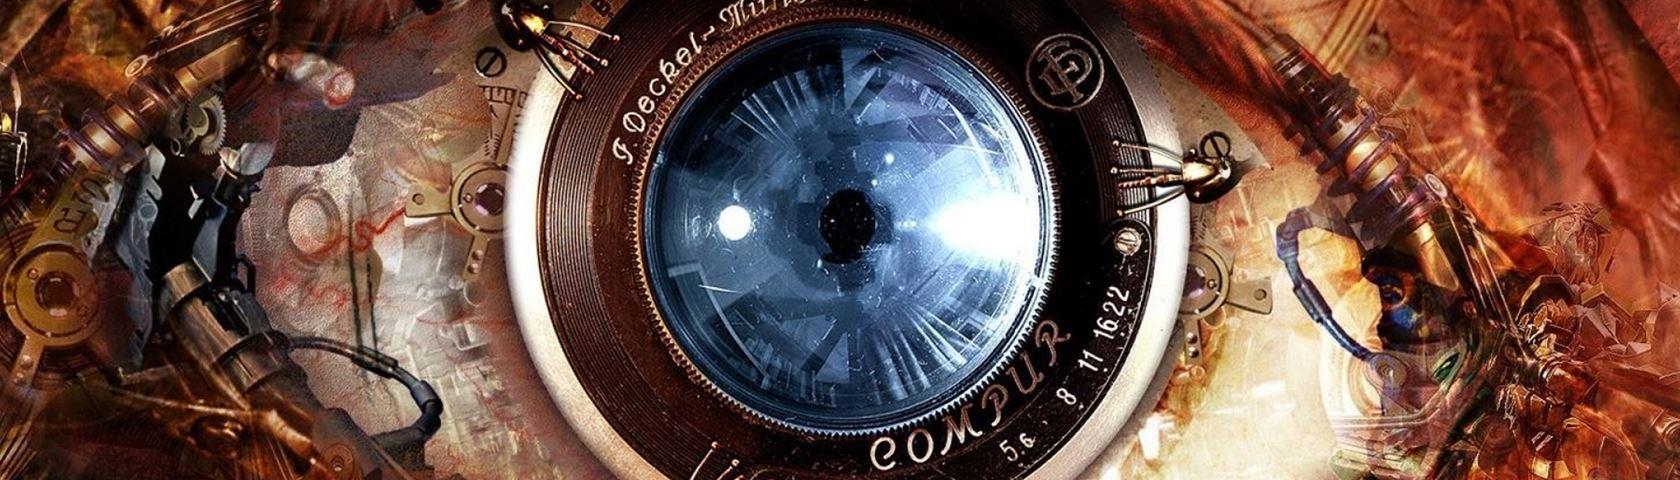 WallpaperFusion digital eye 1680x480 Digital Trends 1680x480